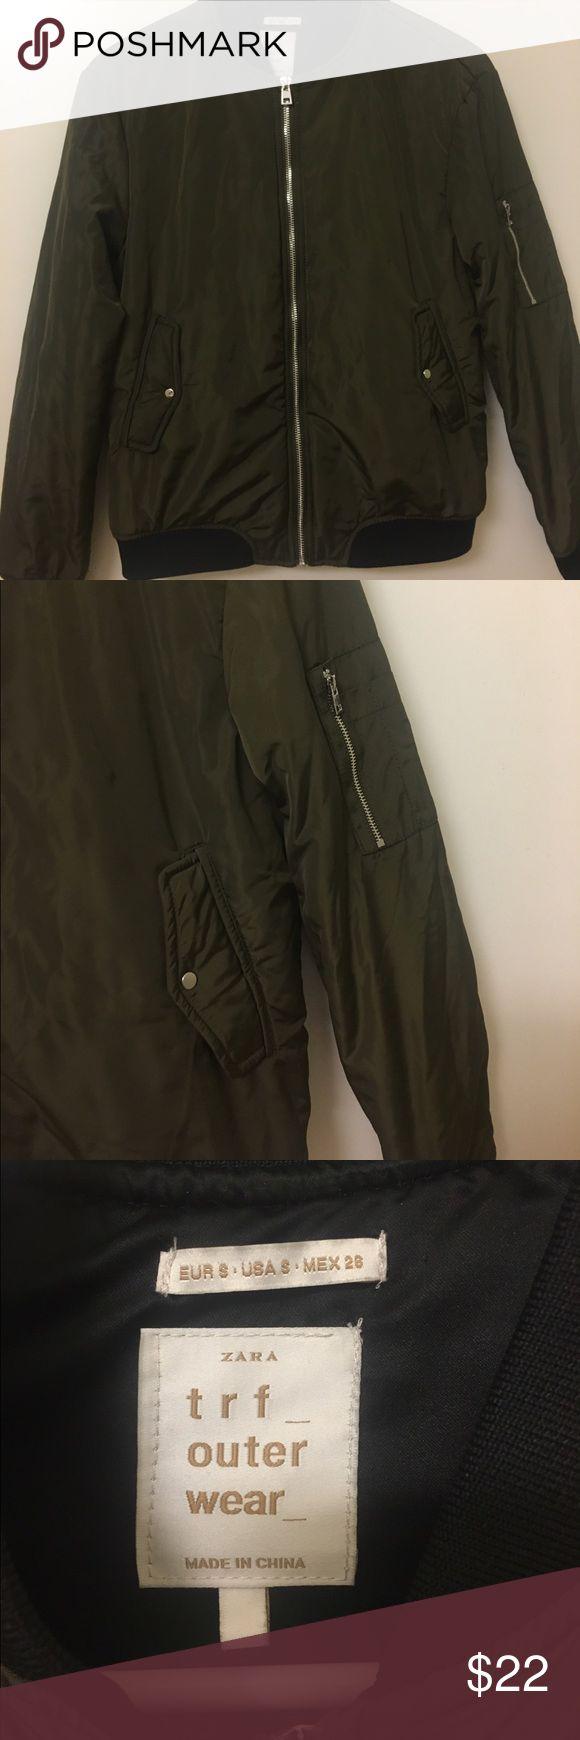 ZARA army green bomber jacket Really thick and warm bomber! Can fit XS-M Zara Jackets & Coats